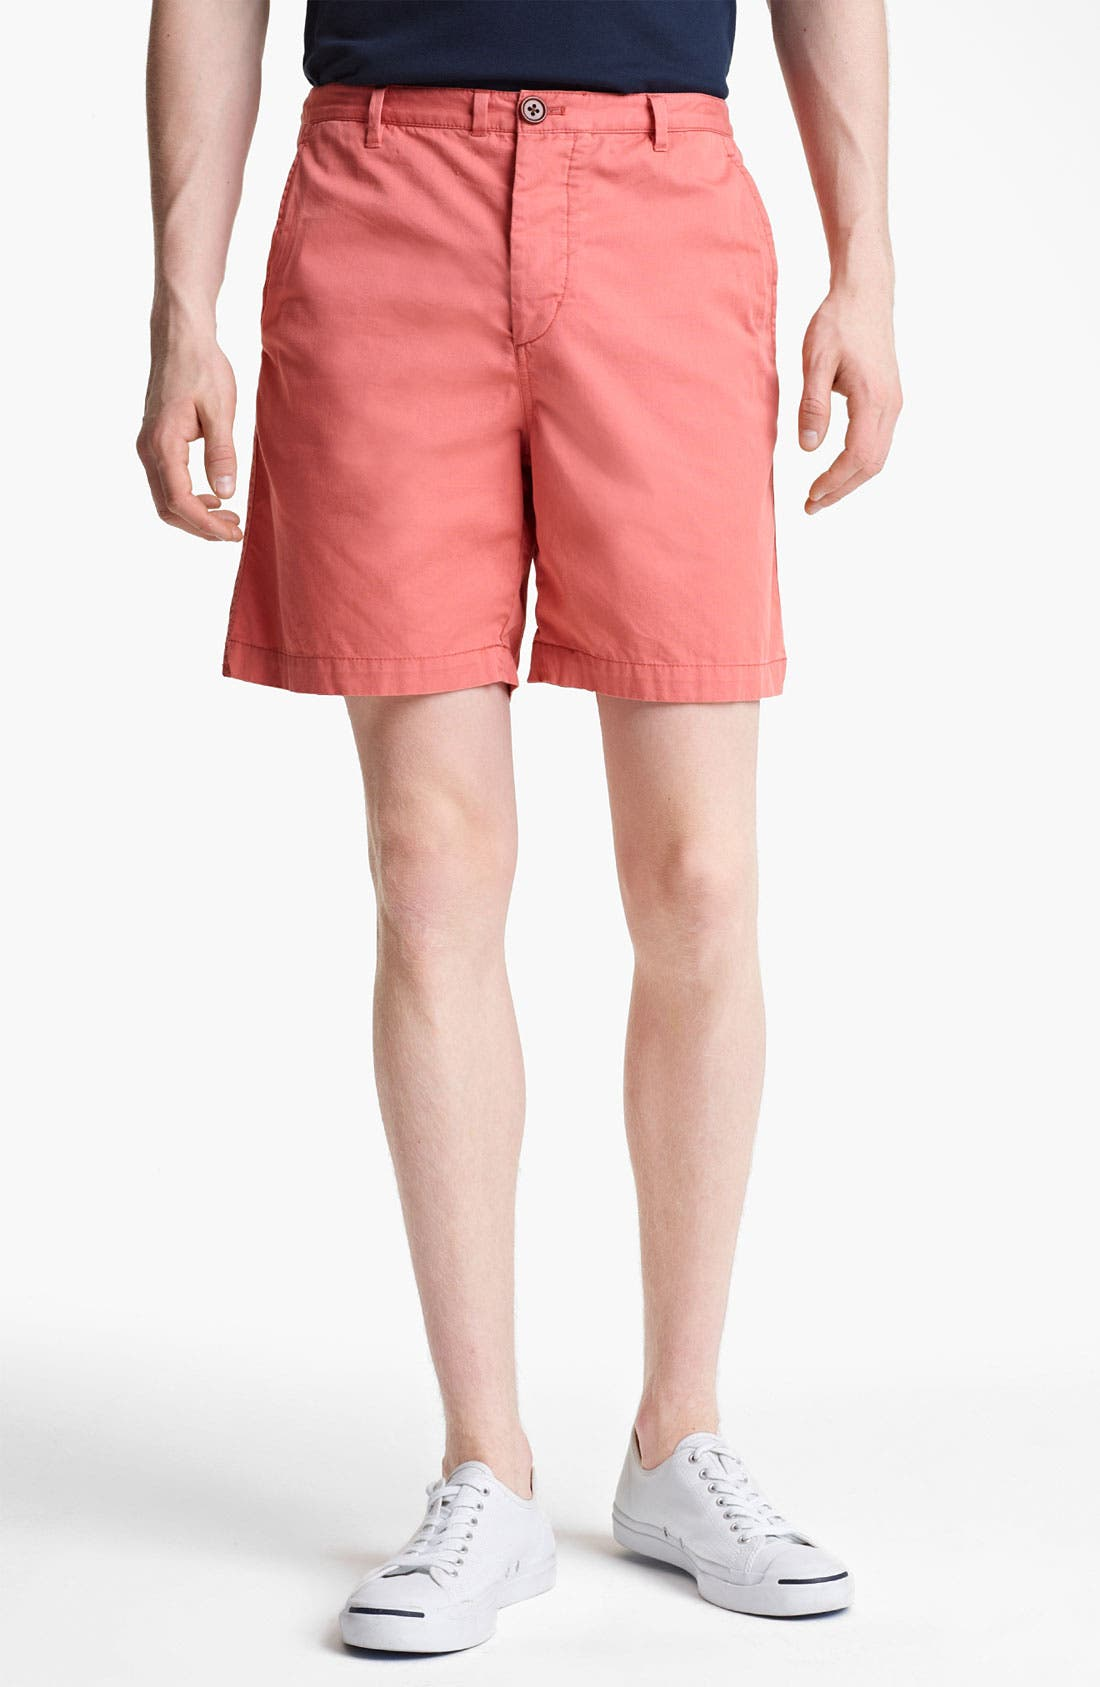 Alternate Image 1 Selected - Shipley & Halmos 'Adams' Shorts